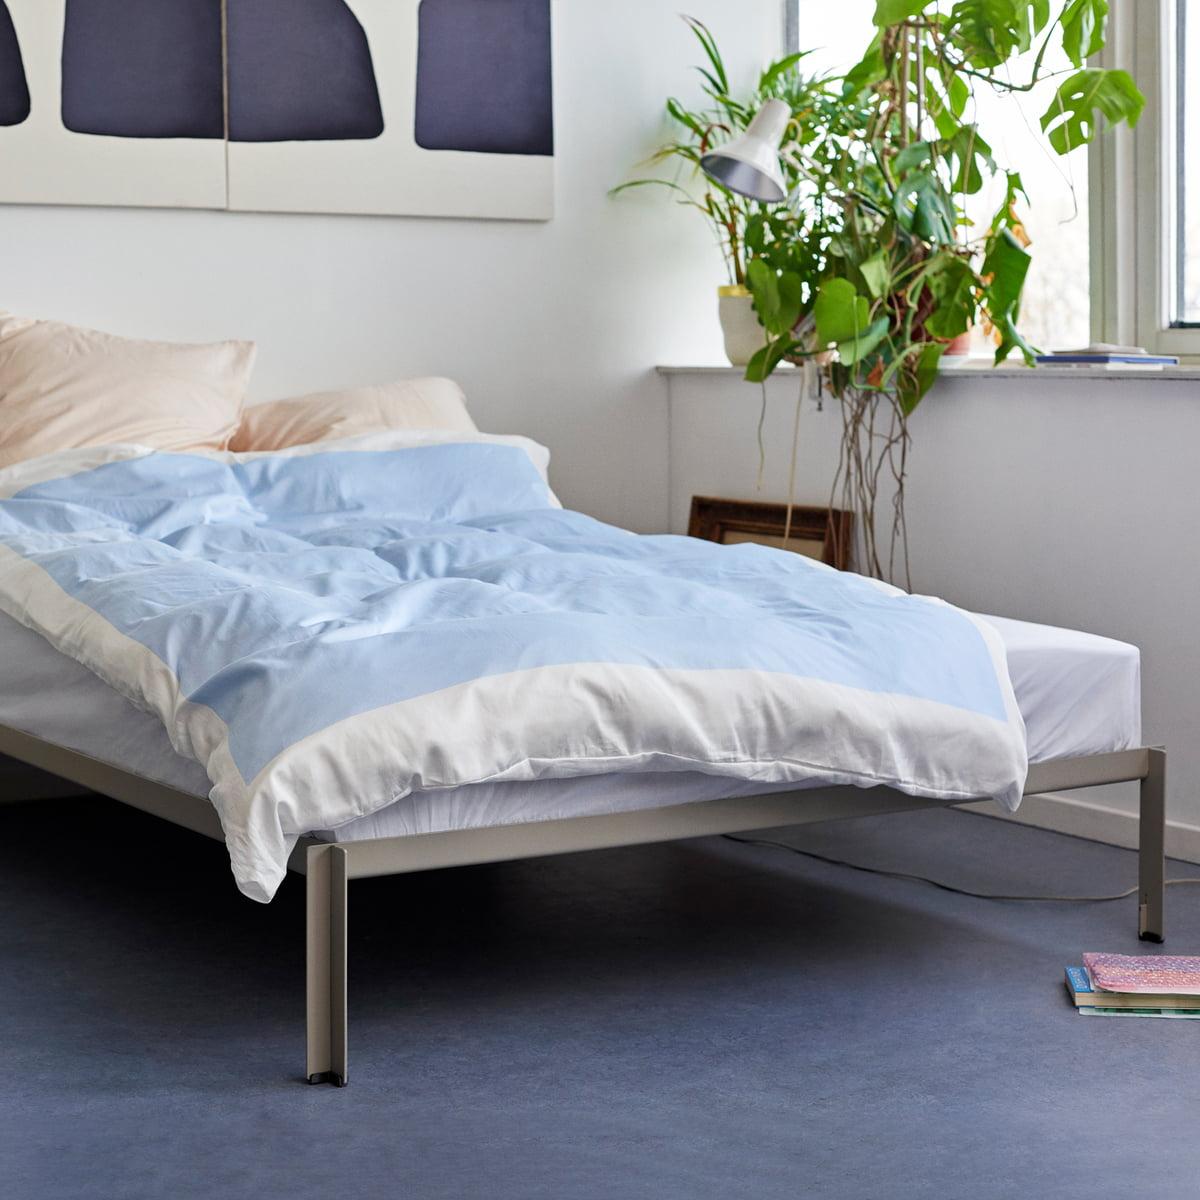 lit connect de hay connox. Black Bedroom Furniture Sets. Home Design Ideas